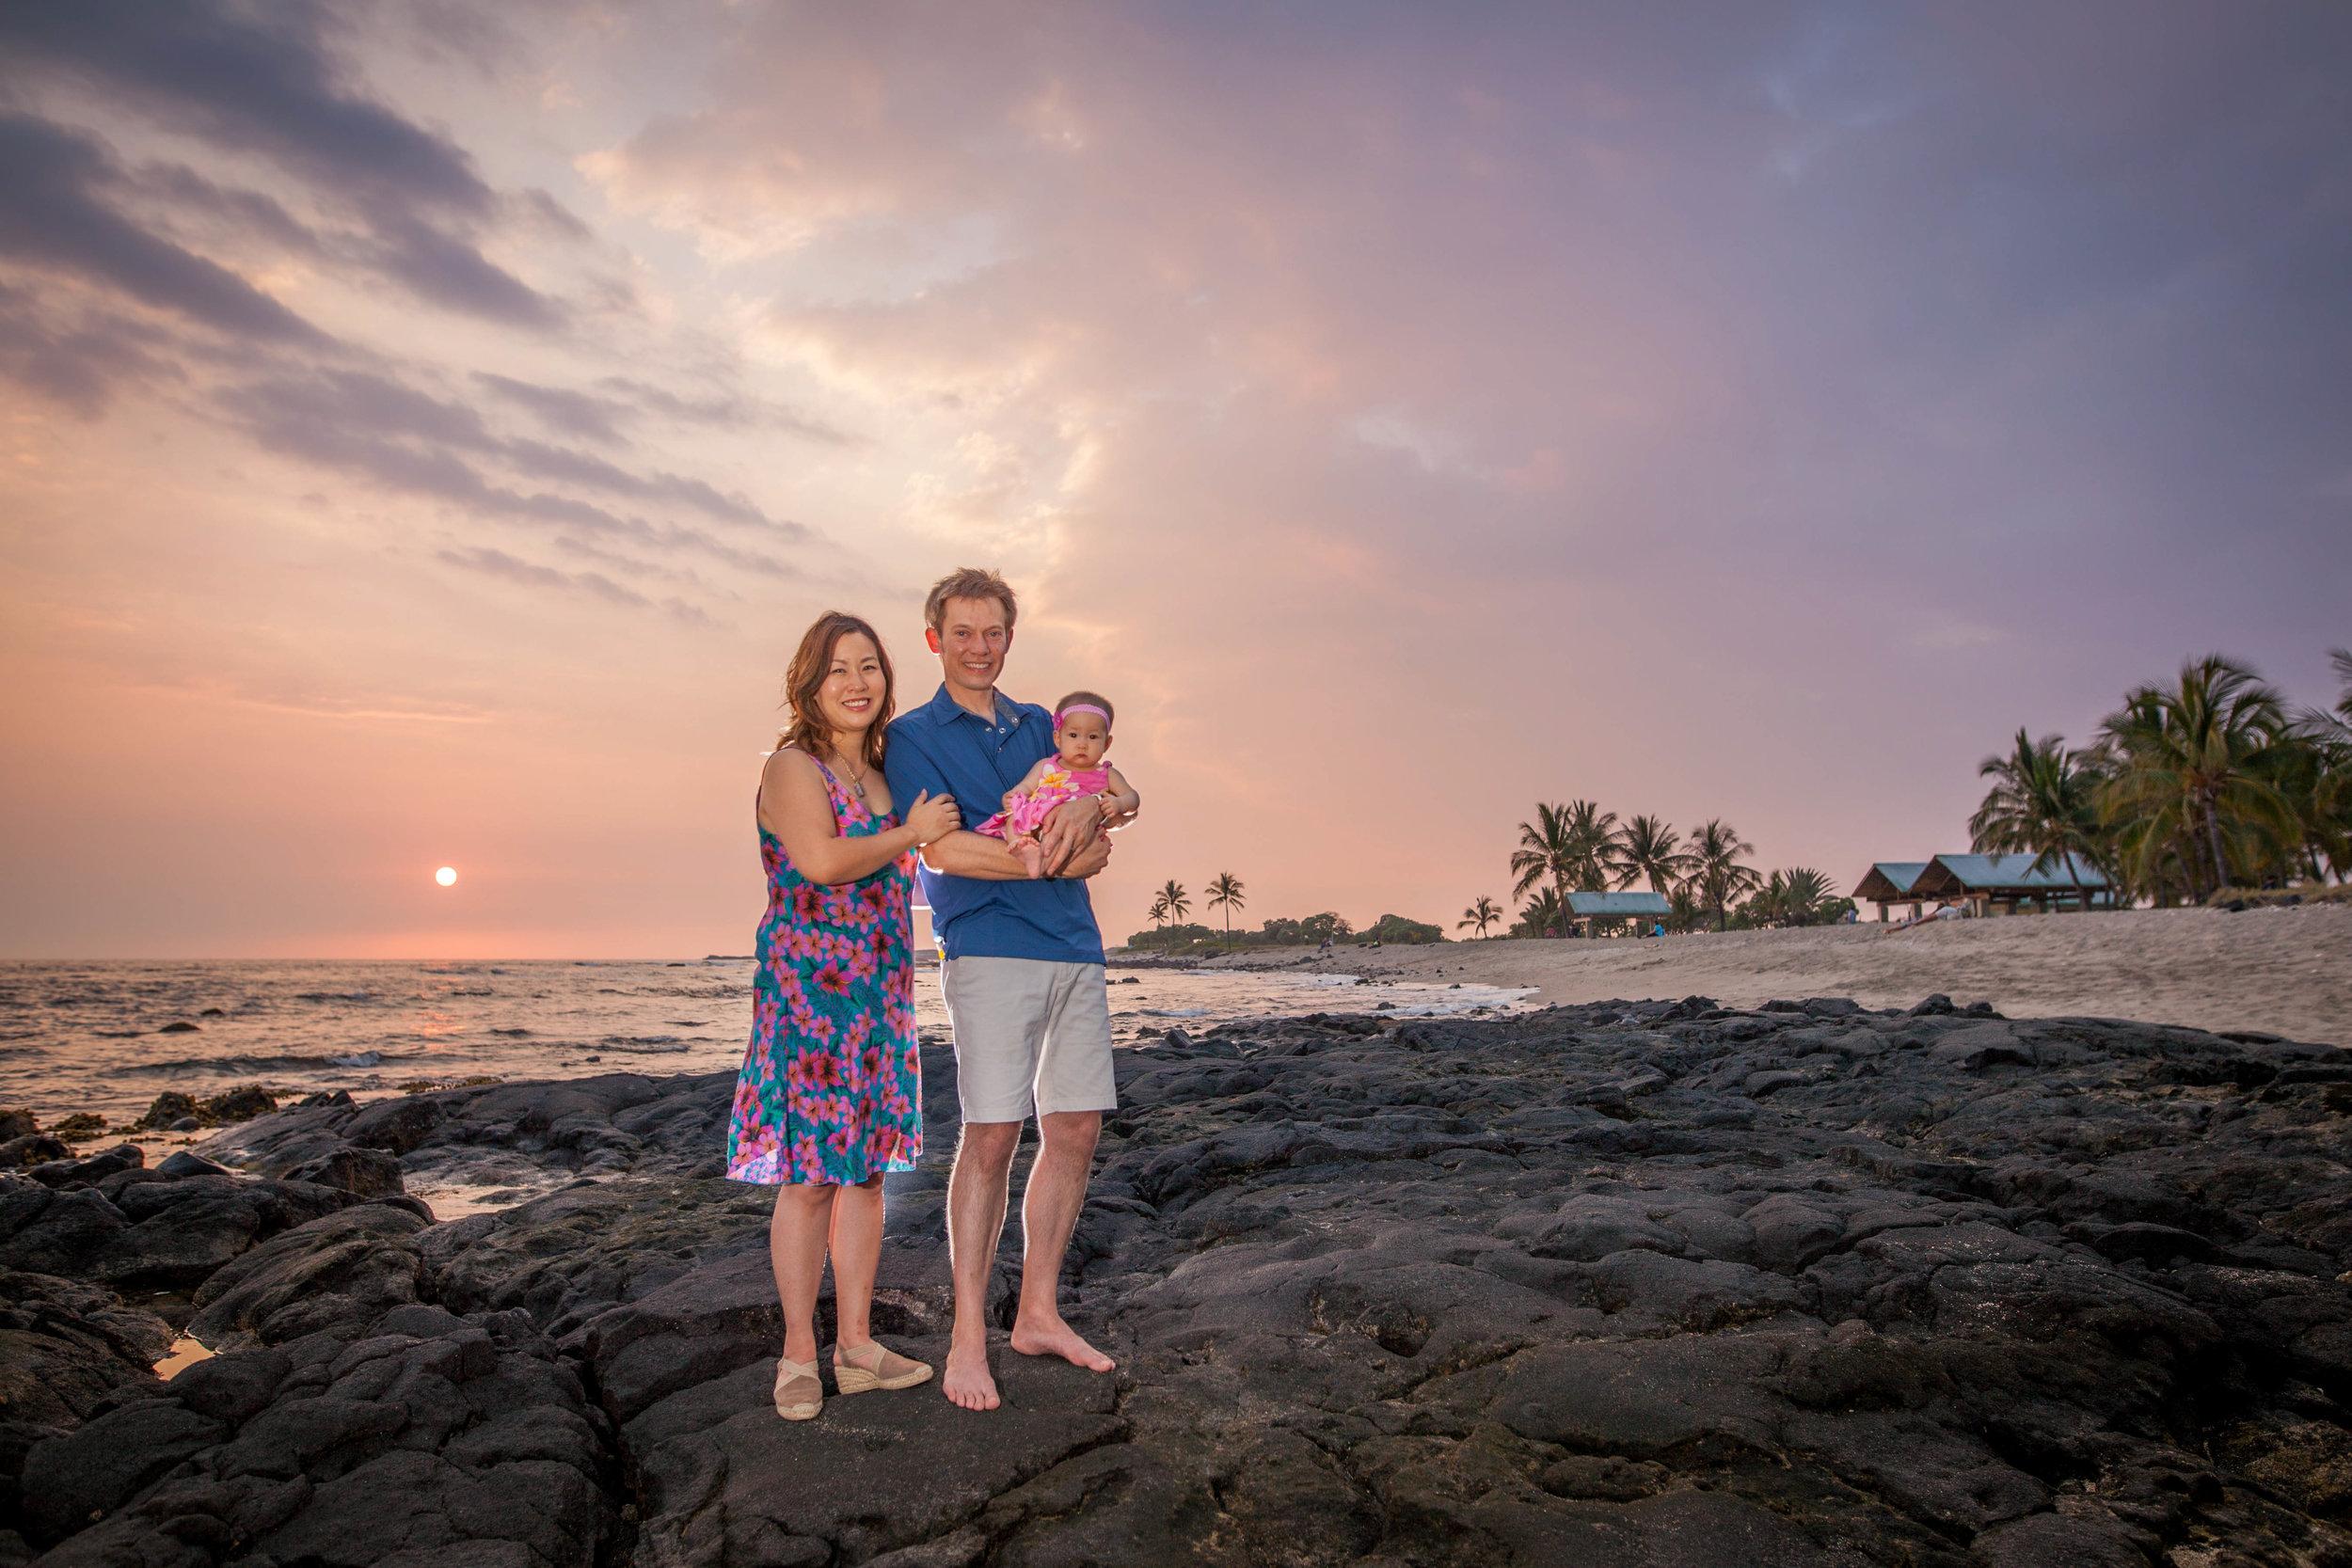 big island hawaii old kona airport beach family © kelilina photography 20170405182605.jpg